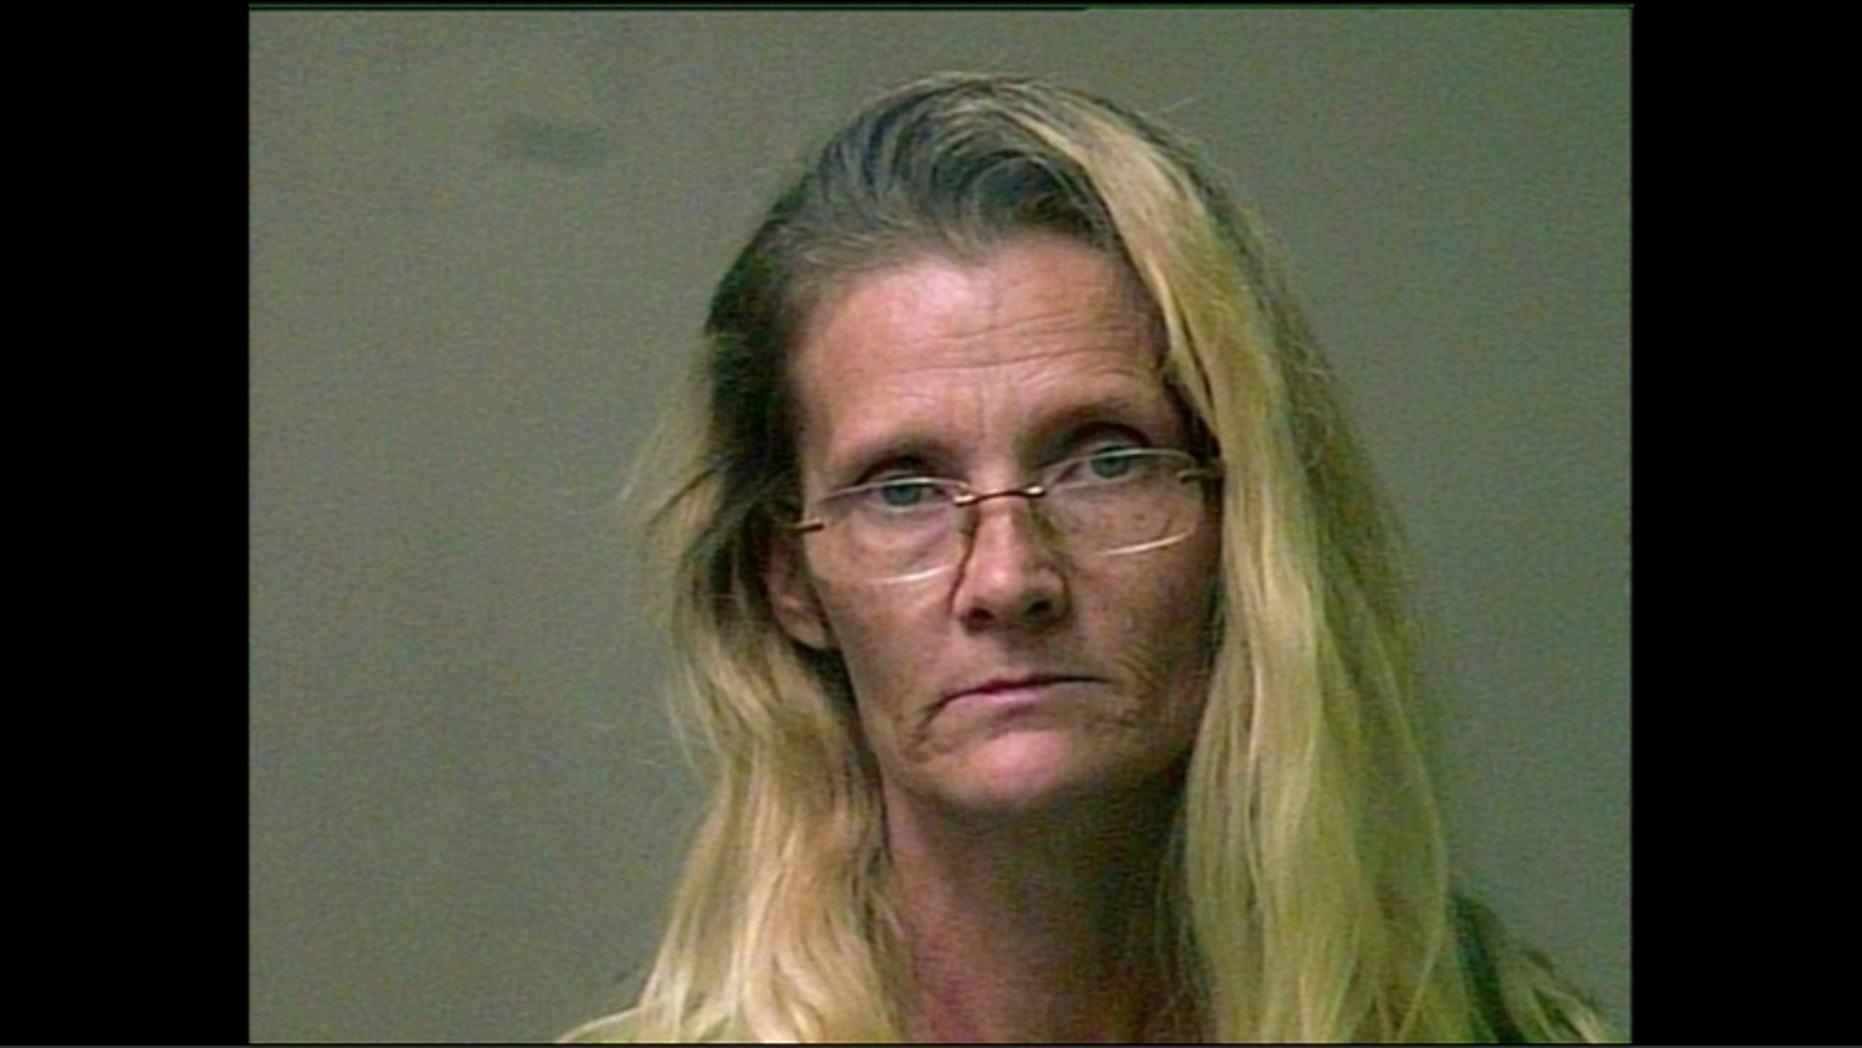 Geneva Robinson was sentenced Thursday for allegedly torturing her granddaughter in 2014.